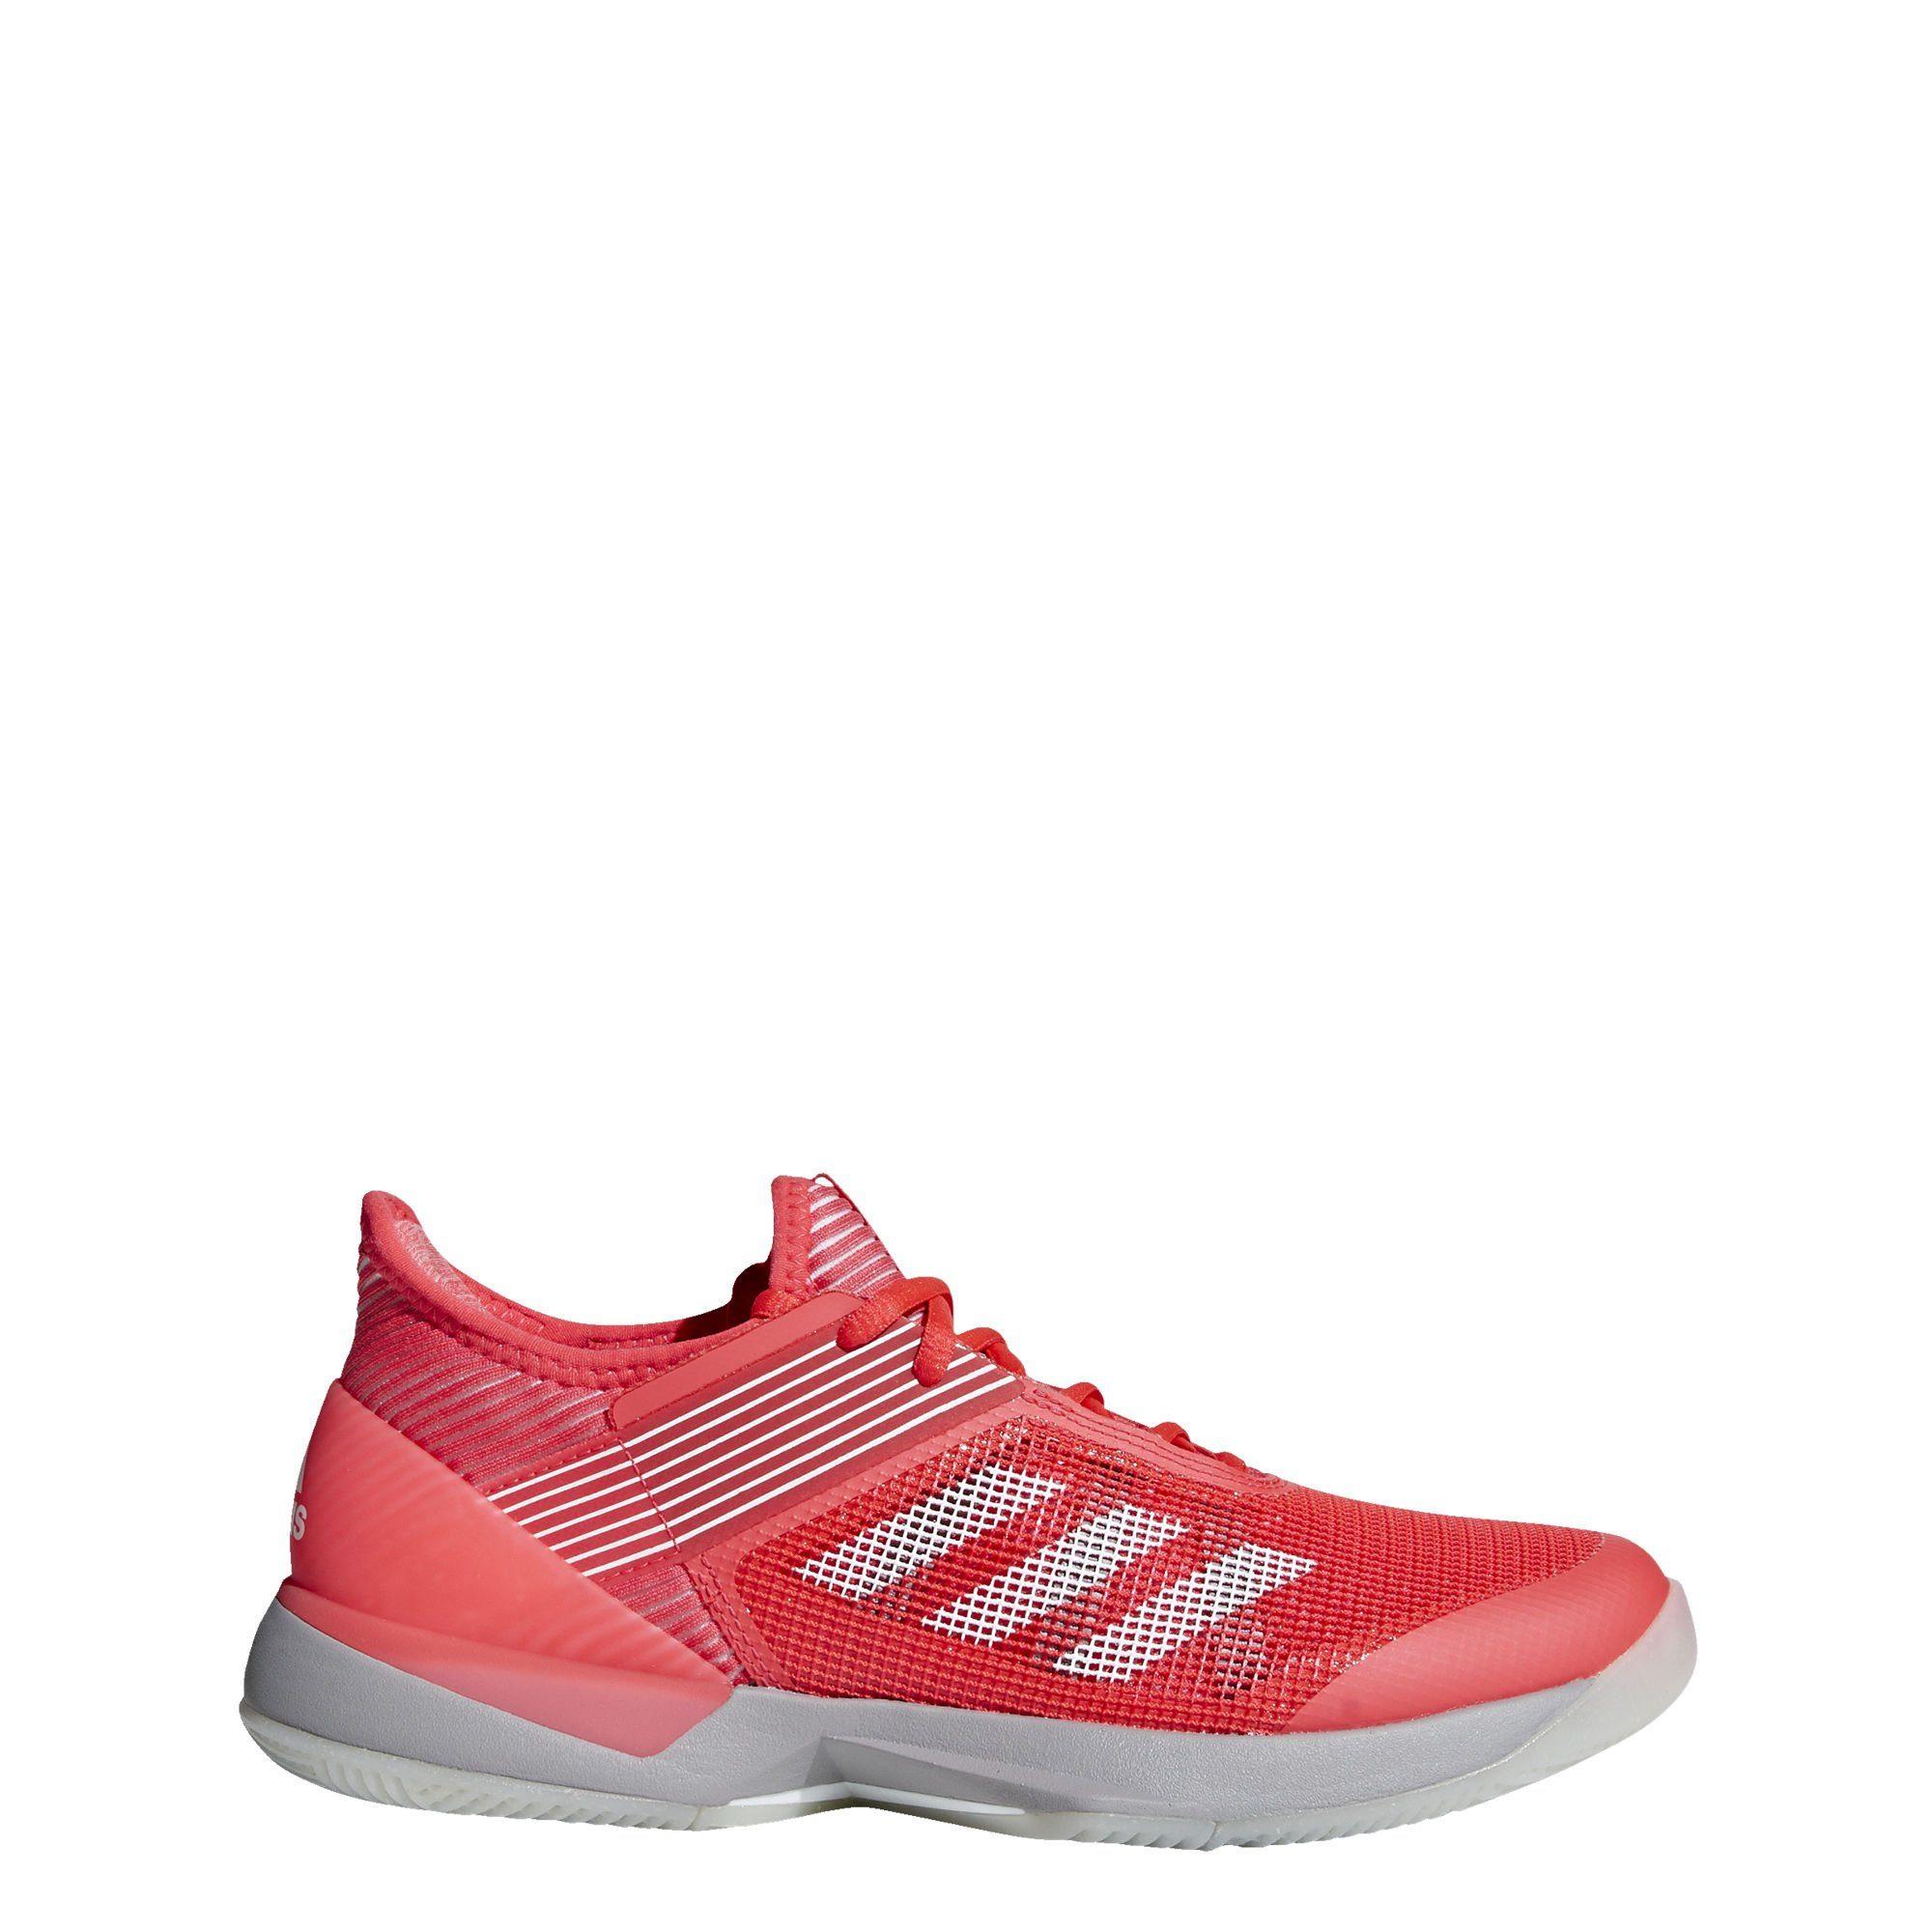 adidas Performance »Adizero Ubersonic 3.0 Schuh« Fitnessschuh adizero online kaufen   OTTO